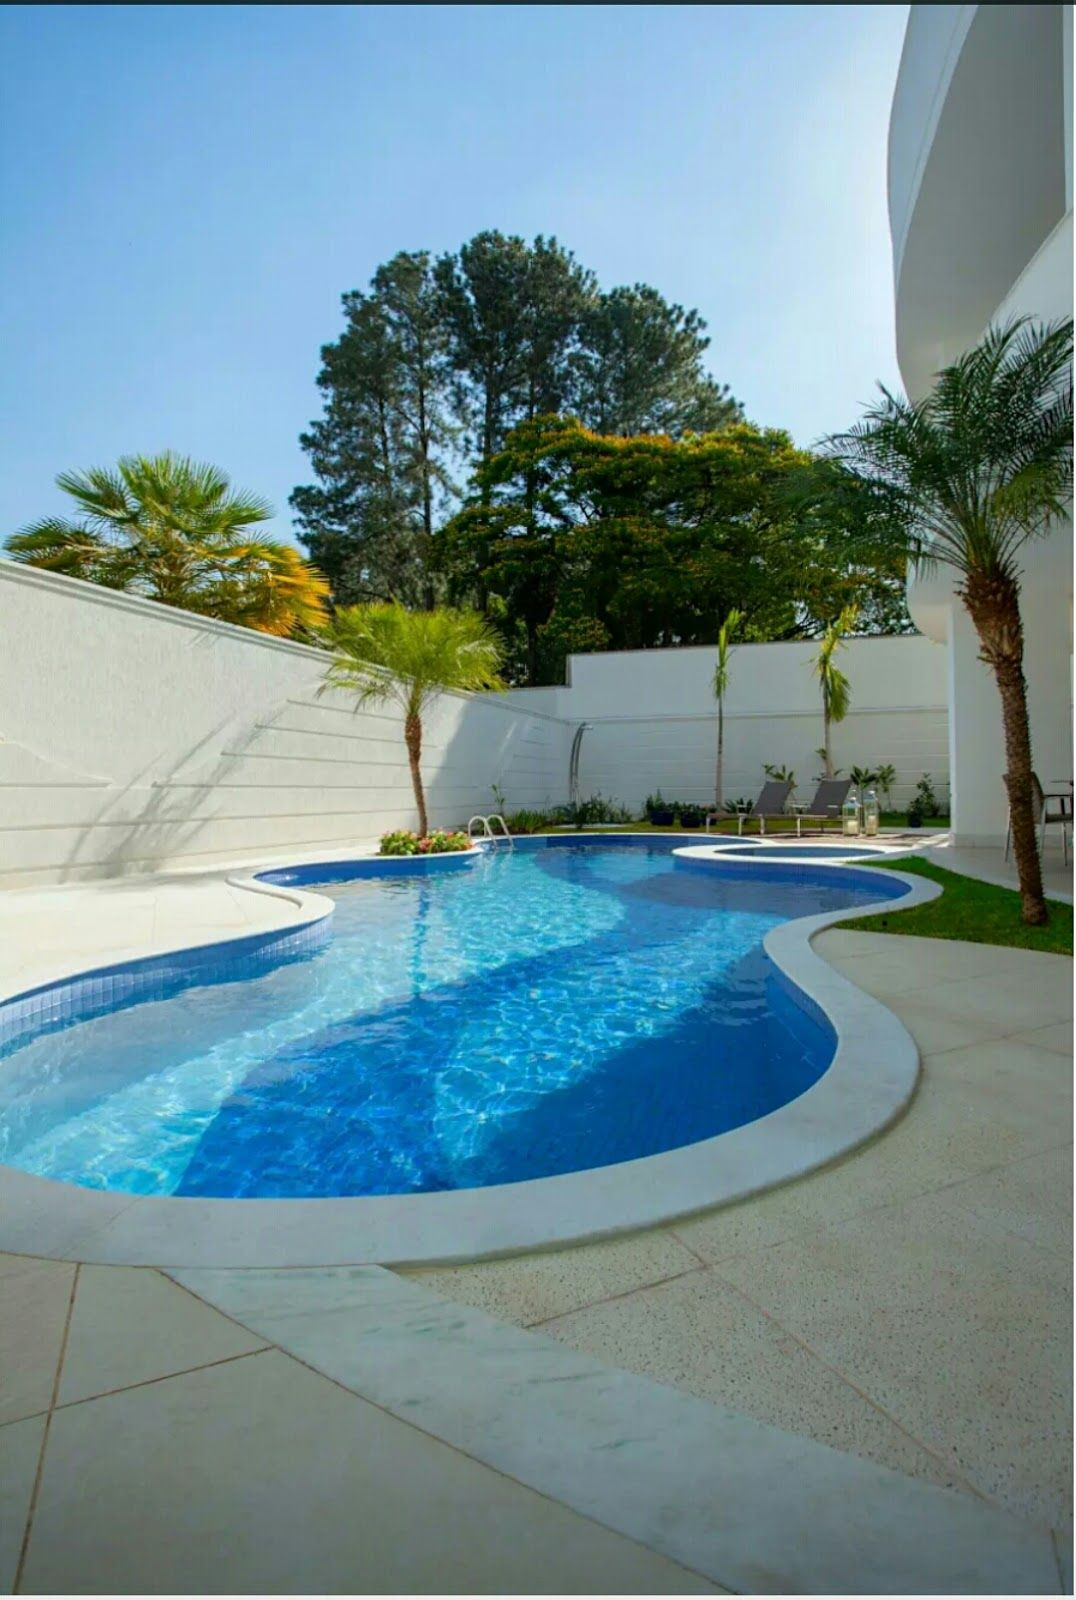 50 Best Inspirational Backyard Swimming Pool Design Ideas 50